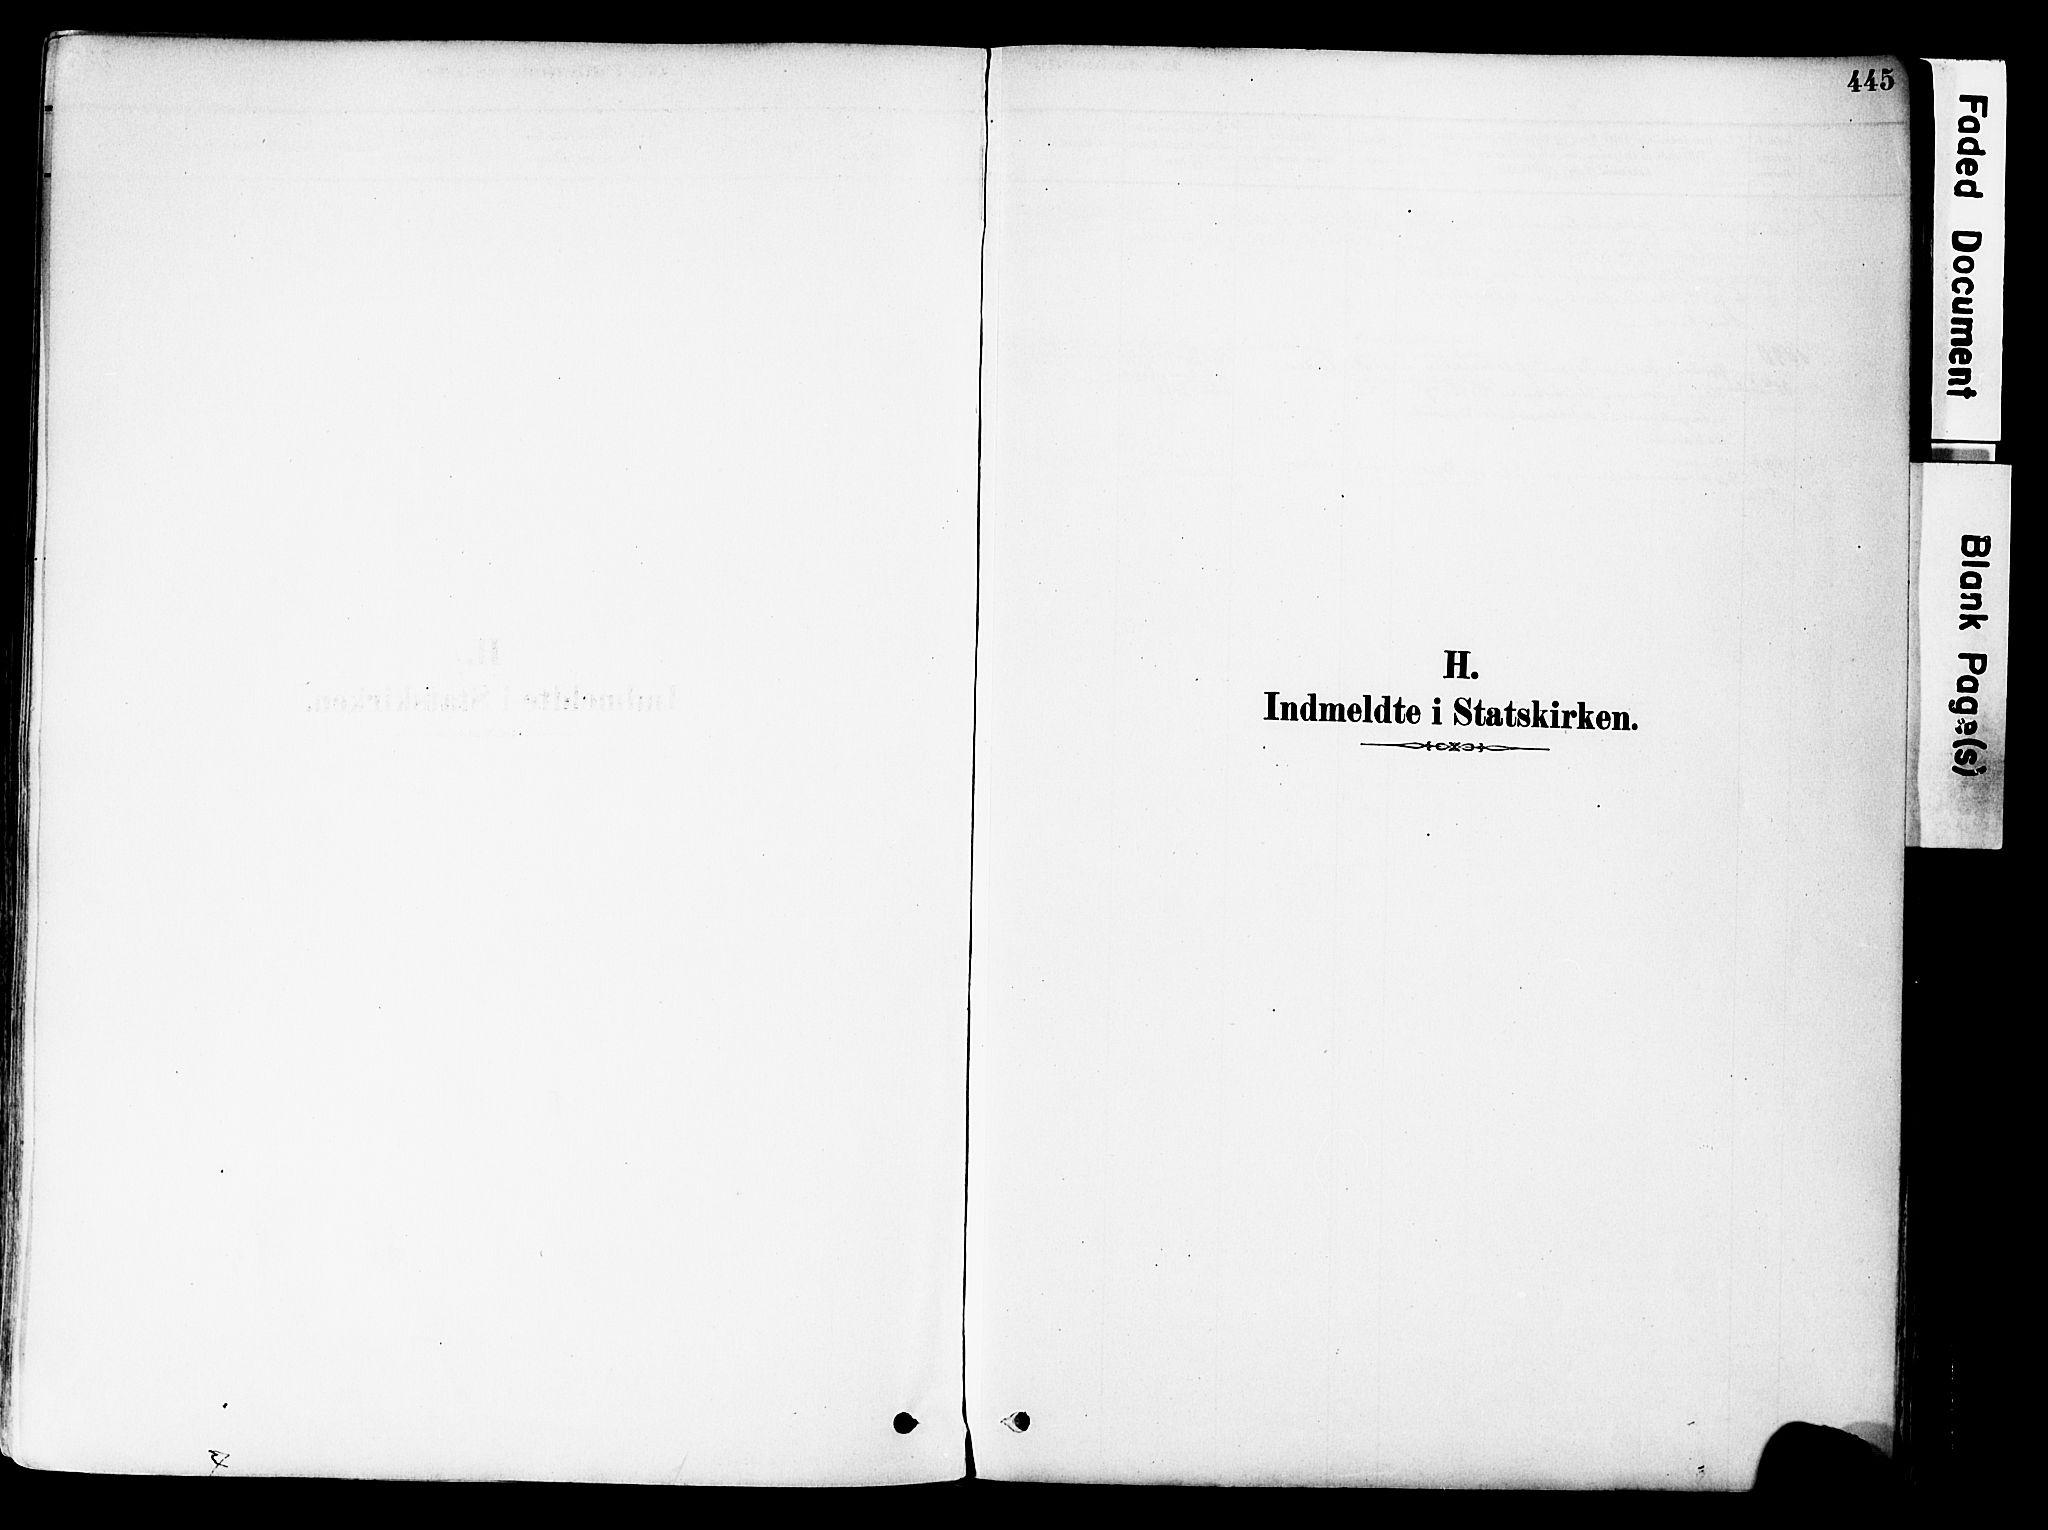 SAH, Østre Toten prestekontor, Ministerialbok nr. 6 /1, 1878-1896, s. 445